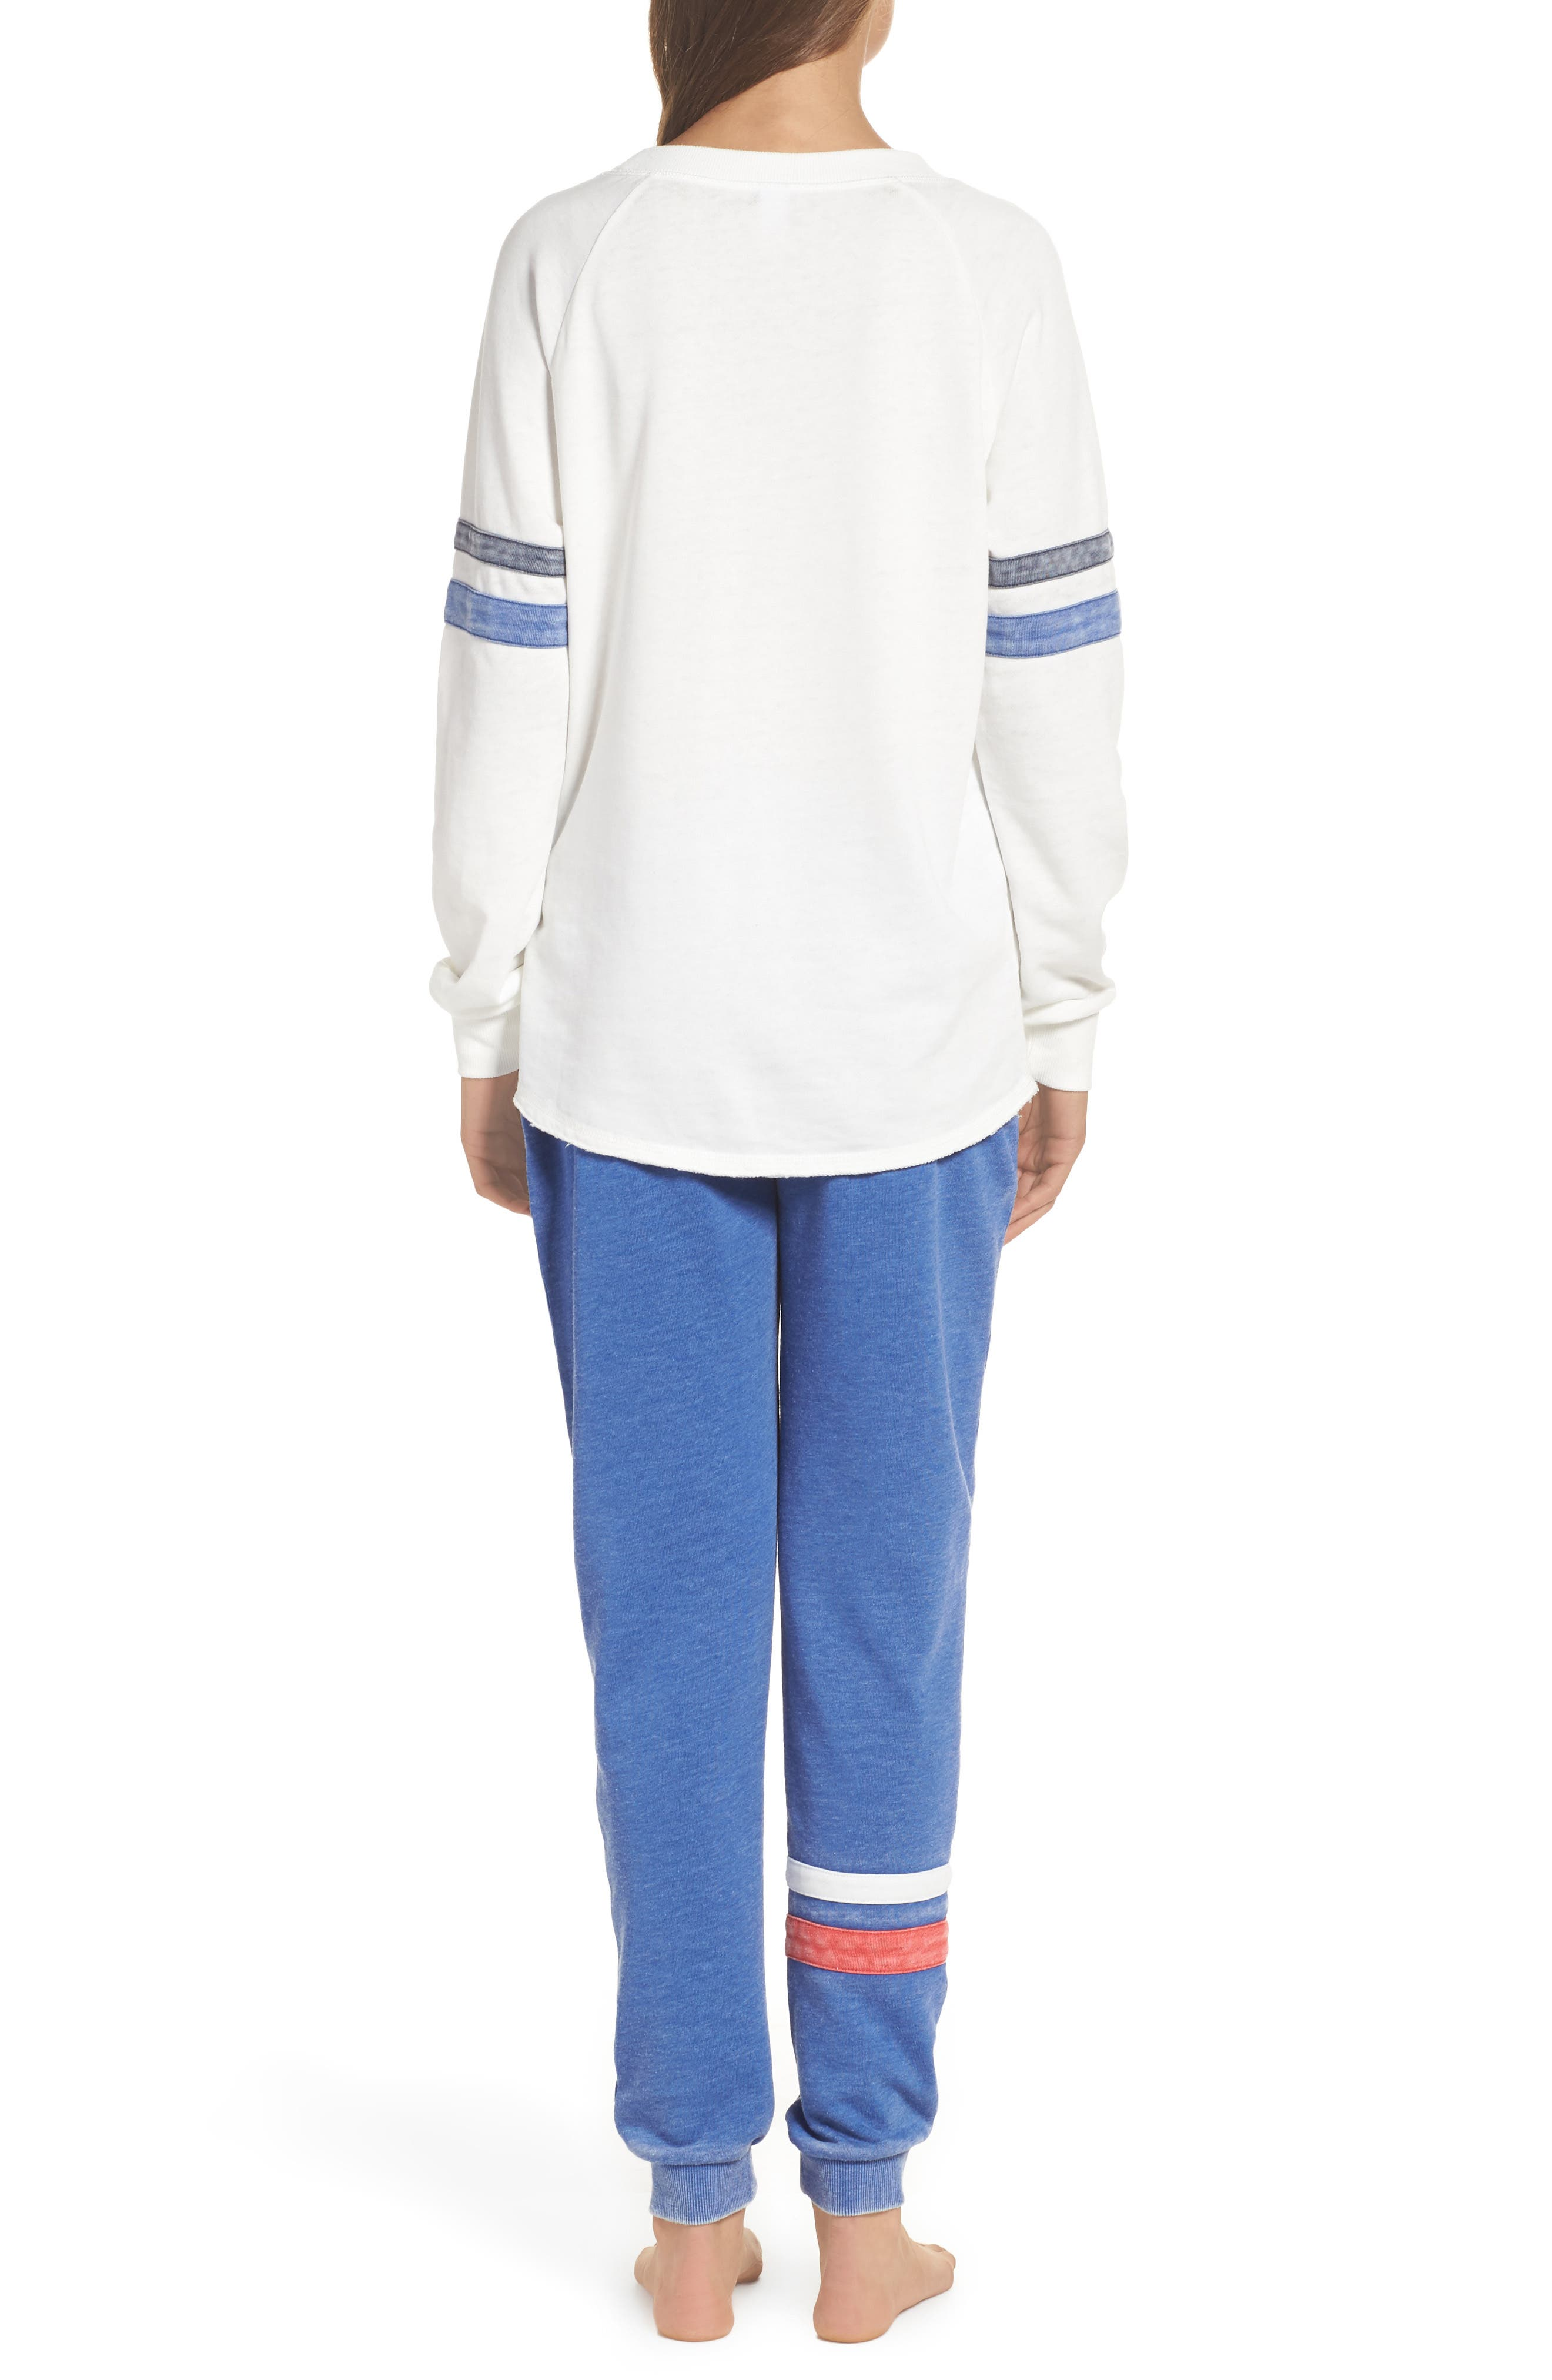 Lazy Day Sweatshirt,                             Alternate thumbnail 2, color,                             Ivory/ Dark Navy/ Pacific Blue